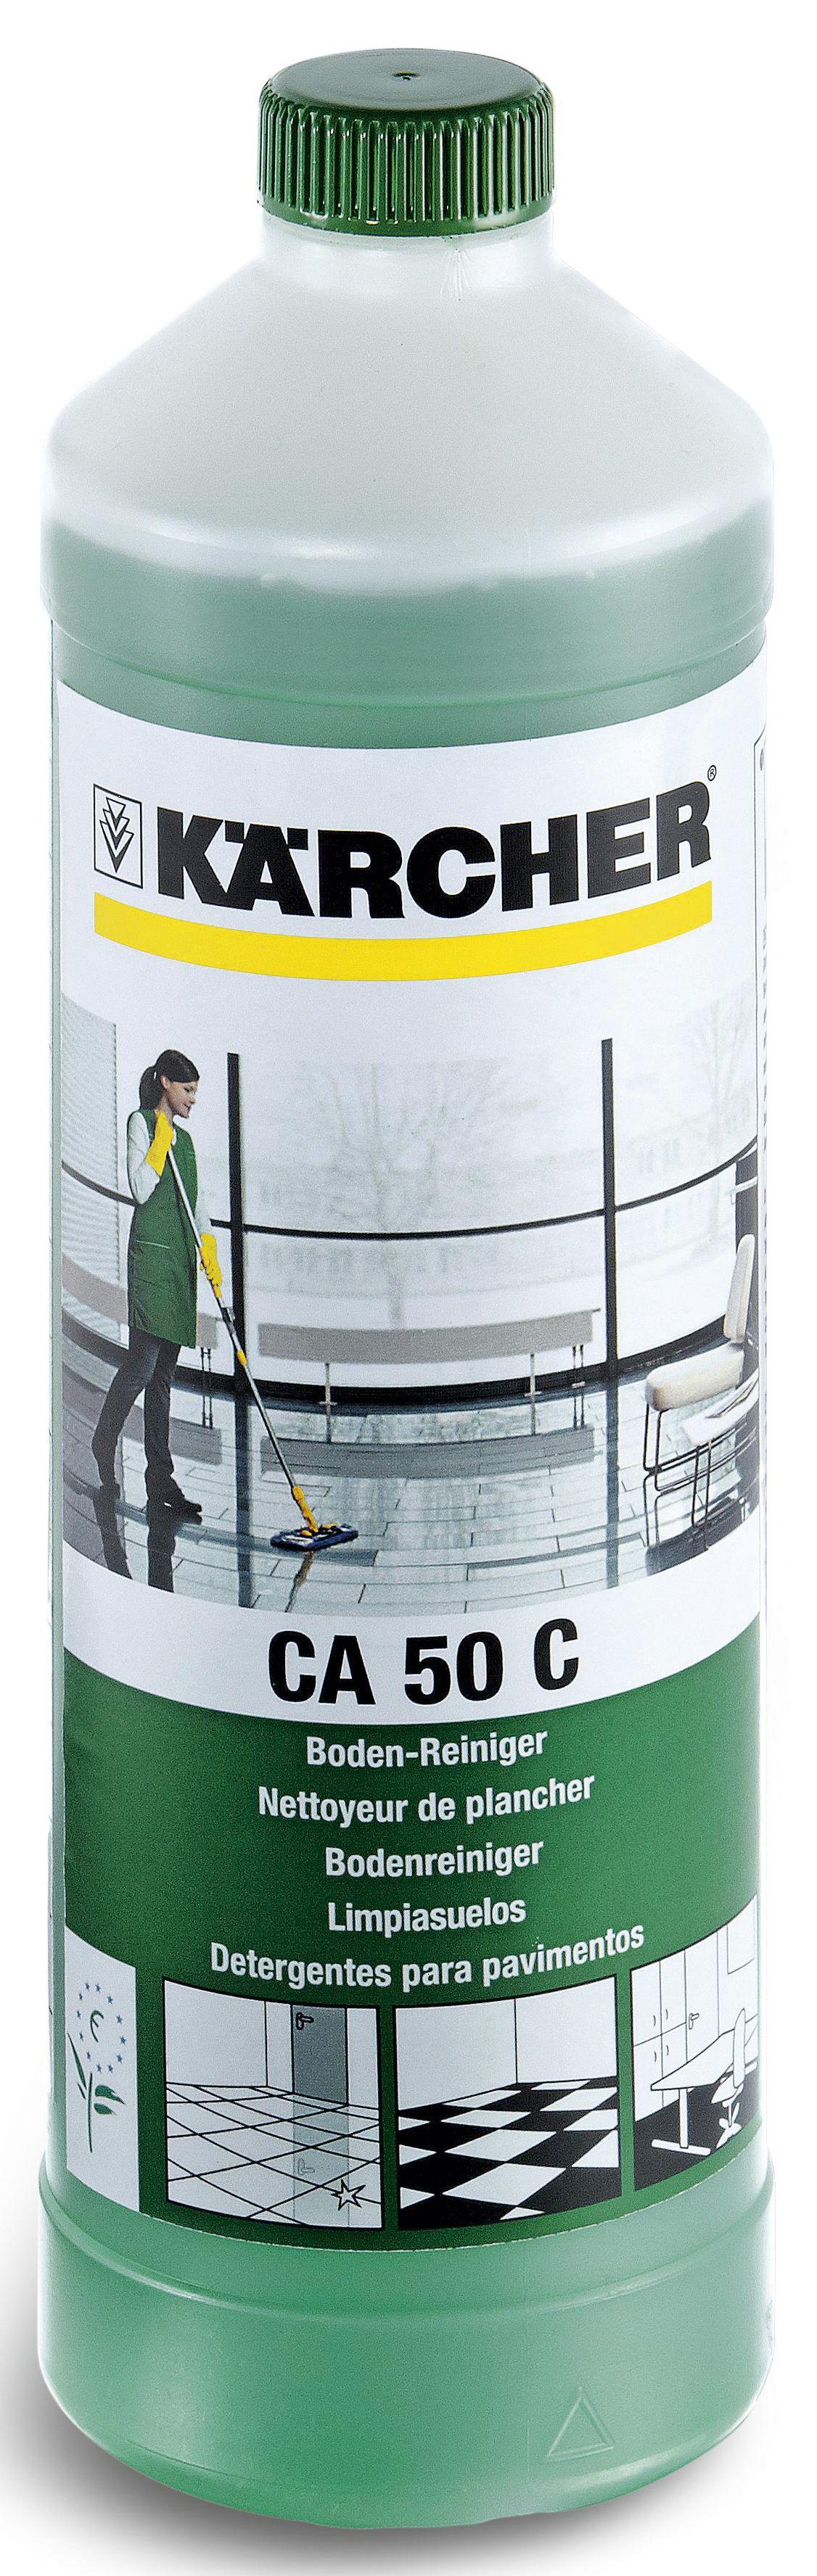 Kärcher Rengjøring CA 50 C 1L 6.295-703.0